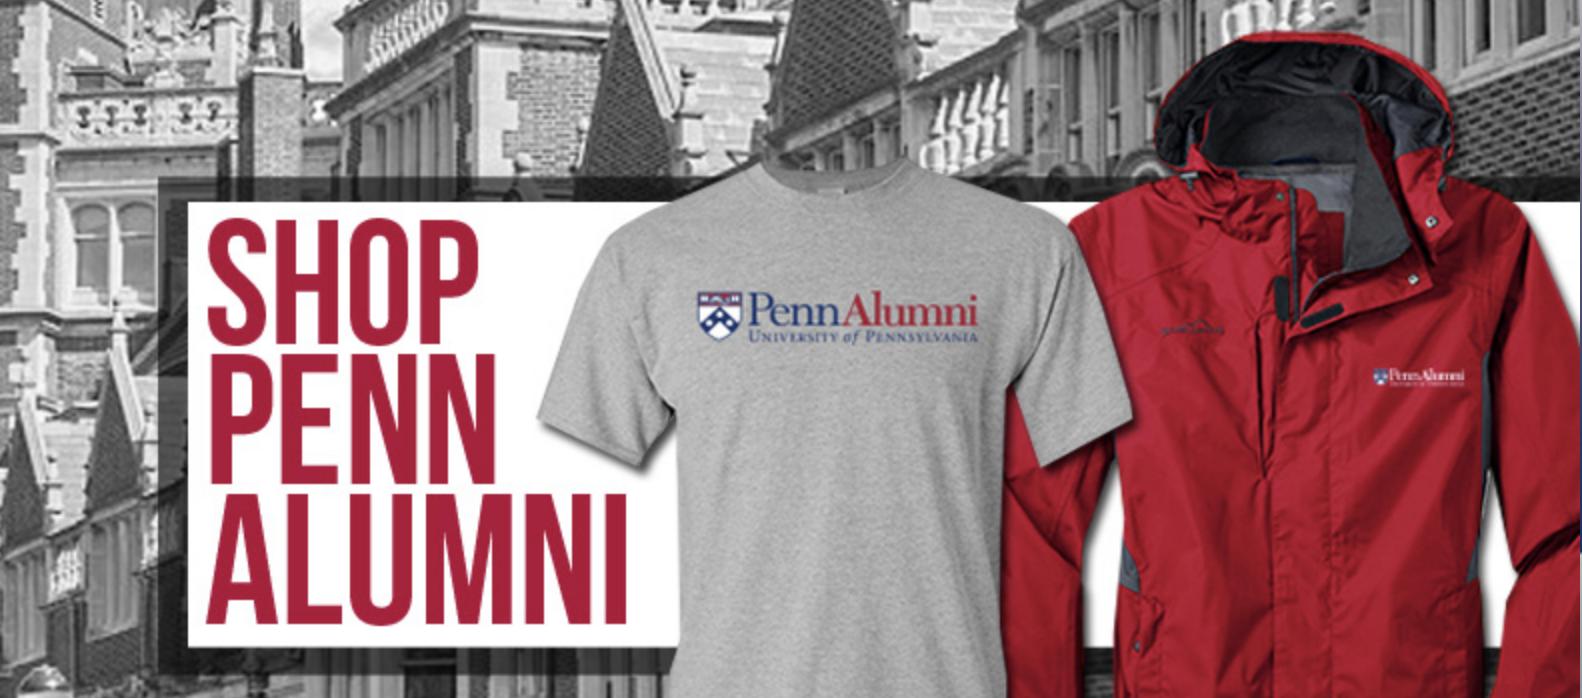 Penn Alumni - Retail Discounts